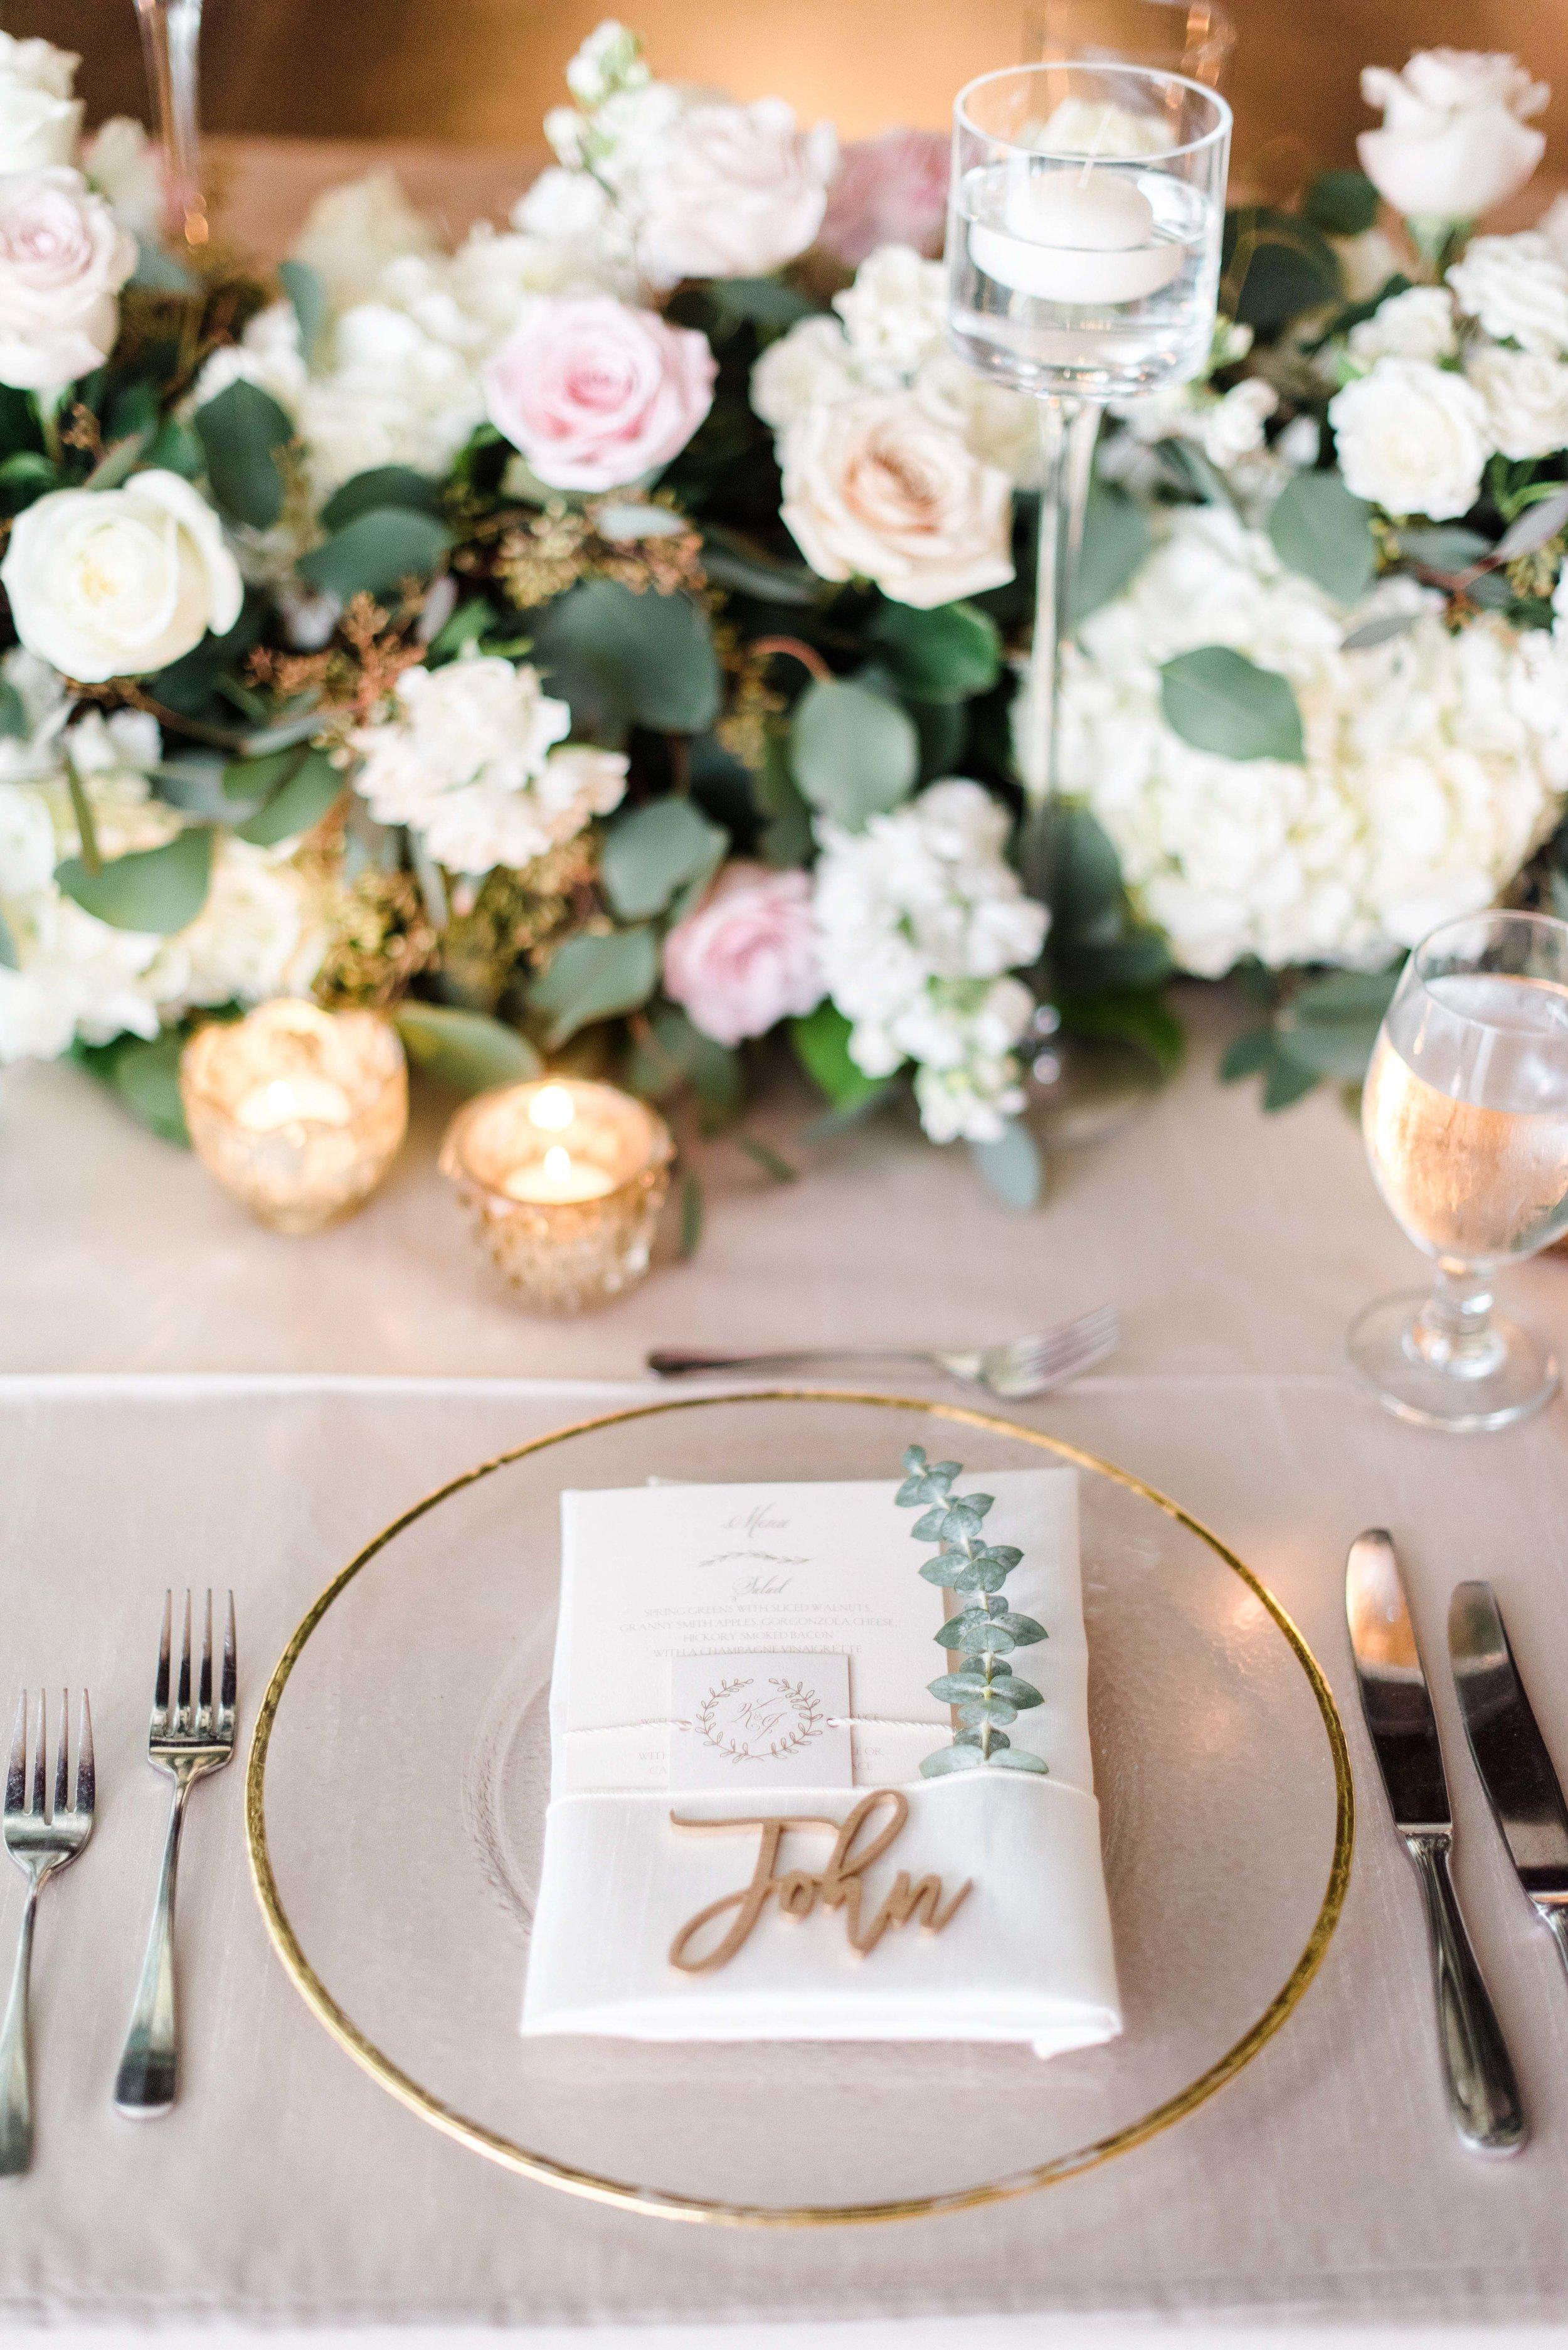 Briscoe-Manor-Houston-Wedding-Photographer-Modern-Luxury-Weddings-Dana-Fernandez-Photograpy-Fine-Art-Photographer-Houston-Film-Destination-PNW-Wedding-Photographer-13.jpg